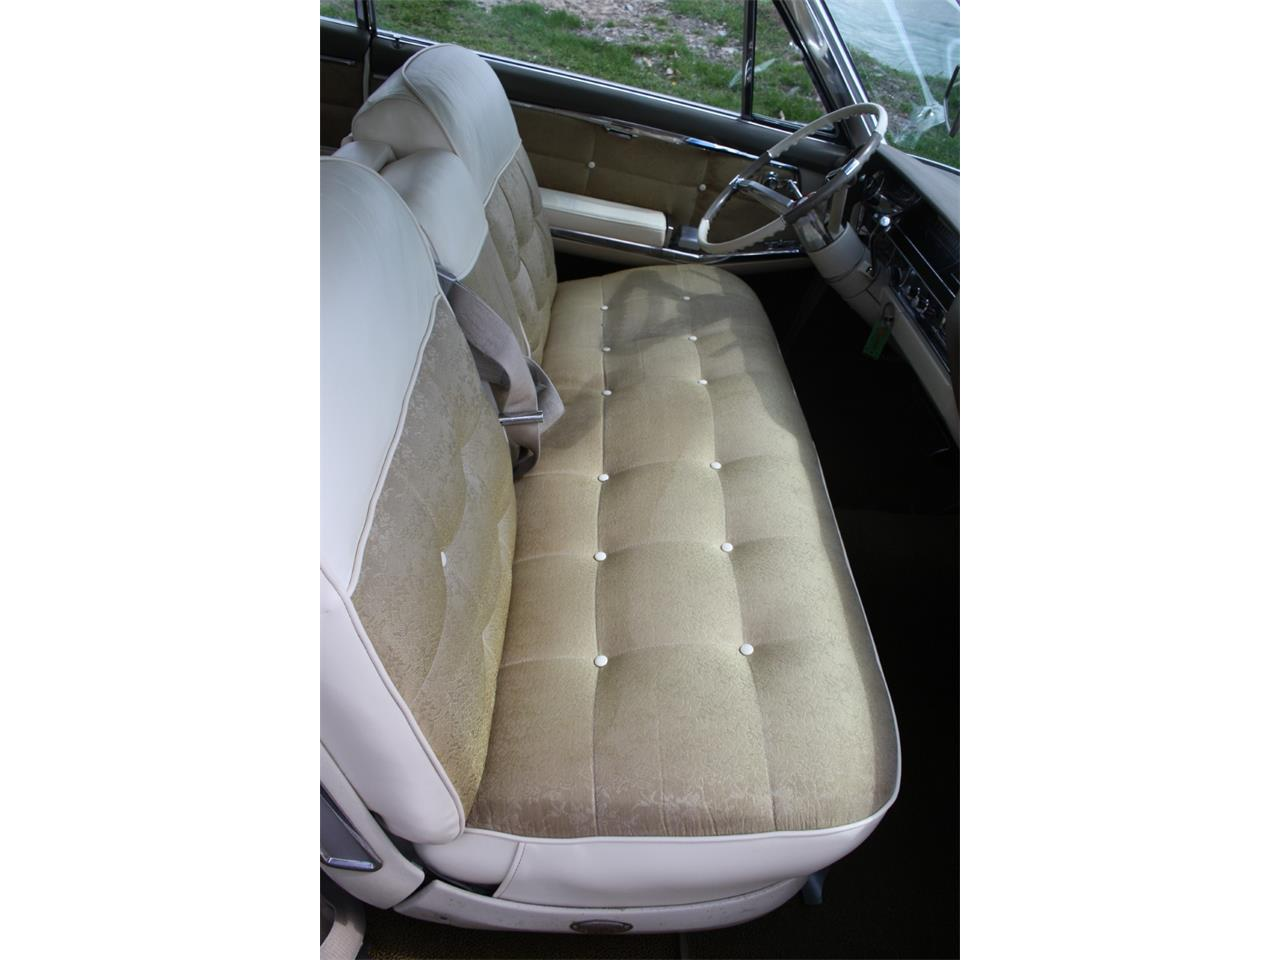 1963 Cadillac DeVille (CC-1220687) for sale in Tacoma, Washington